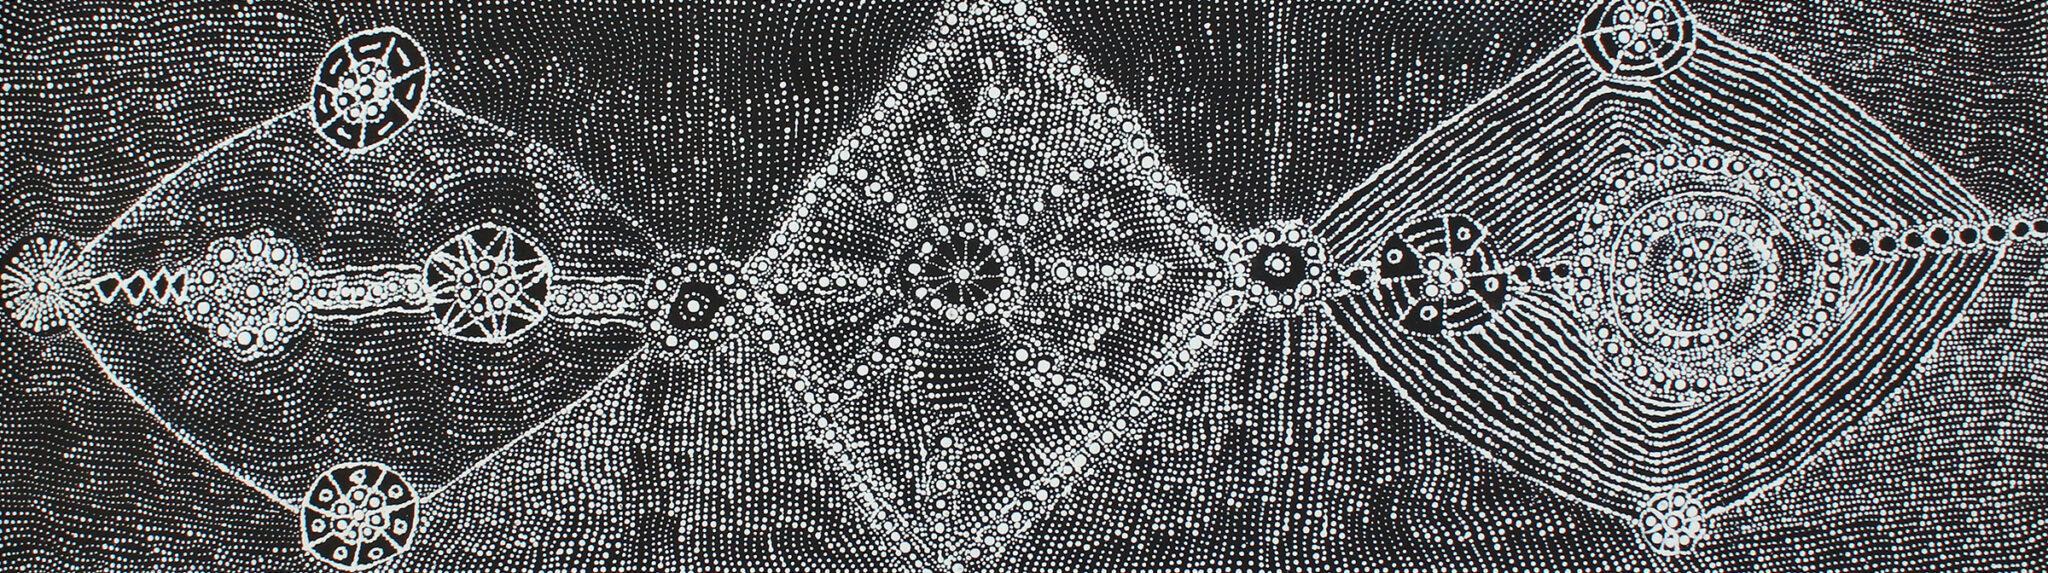 Lukarrara Jukurrpa (Desert Fringe Rush Seed) by Hilda Nakamarra Rogers